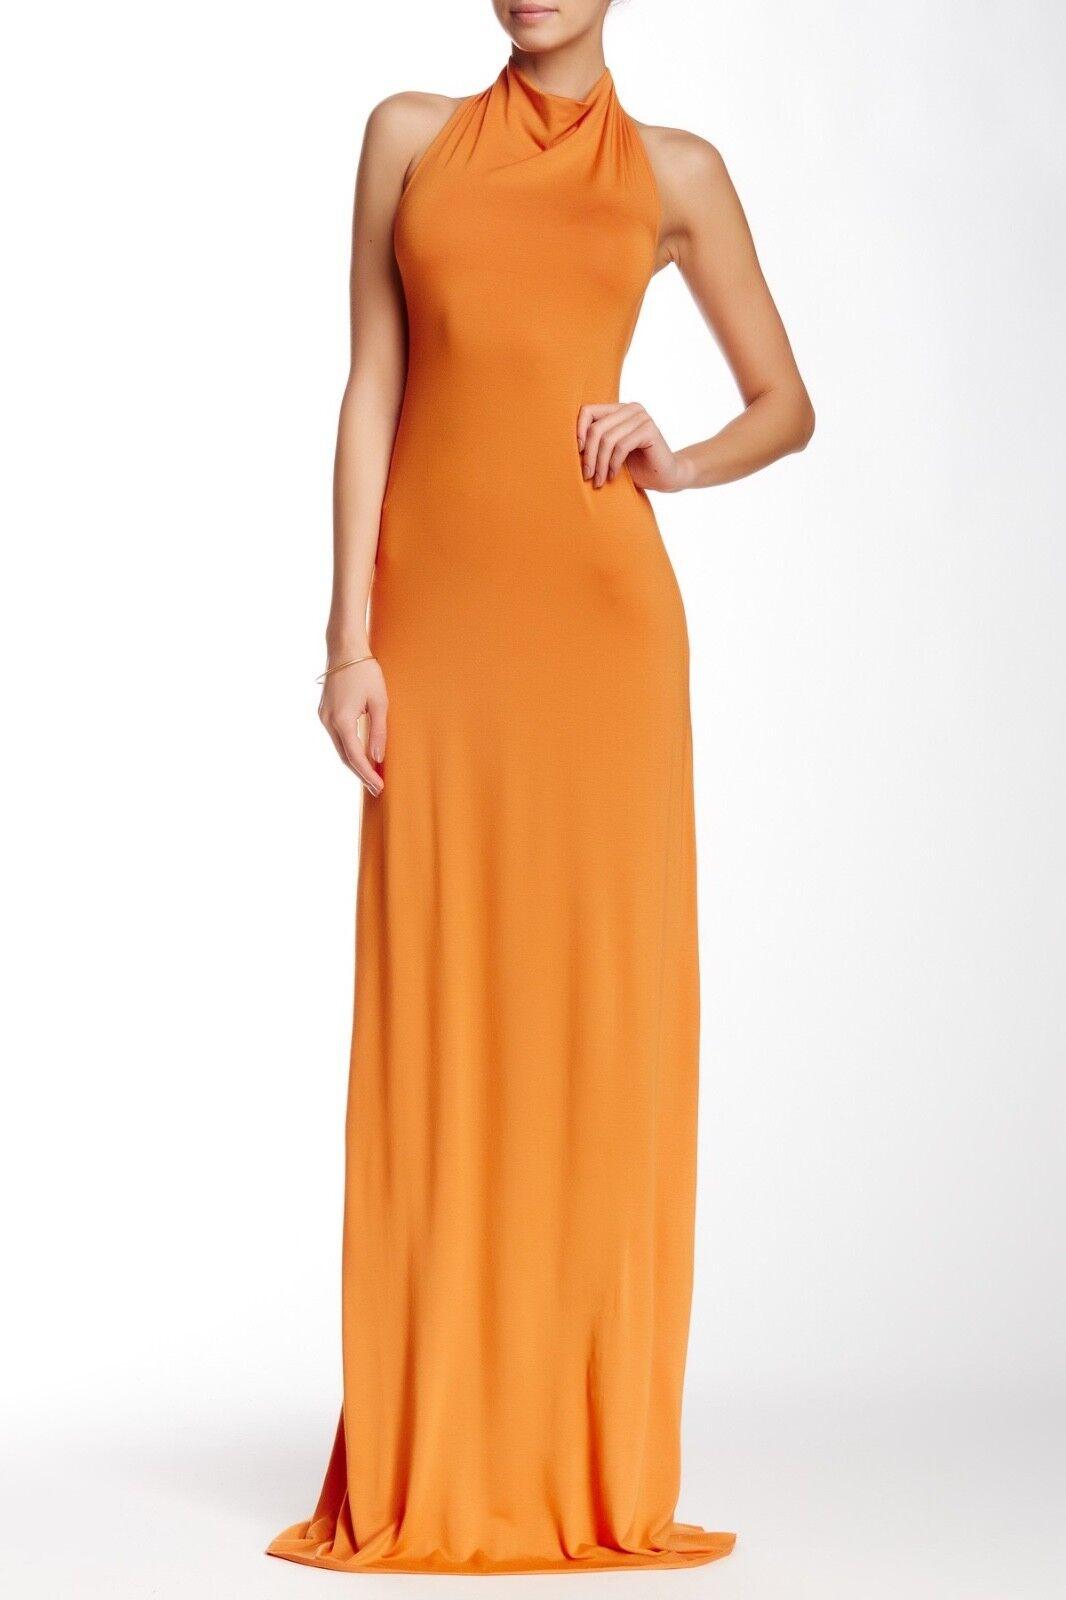 233 Rachel Pally-Women's Bellini Nicolas Dress Sz S